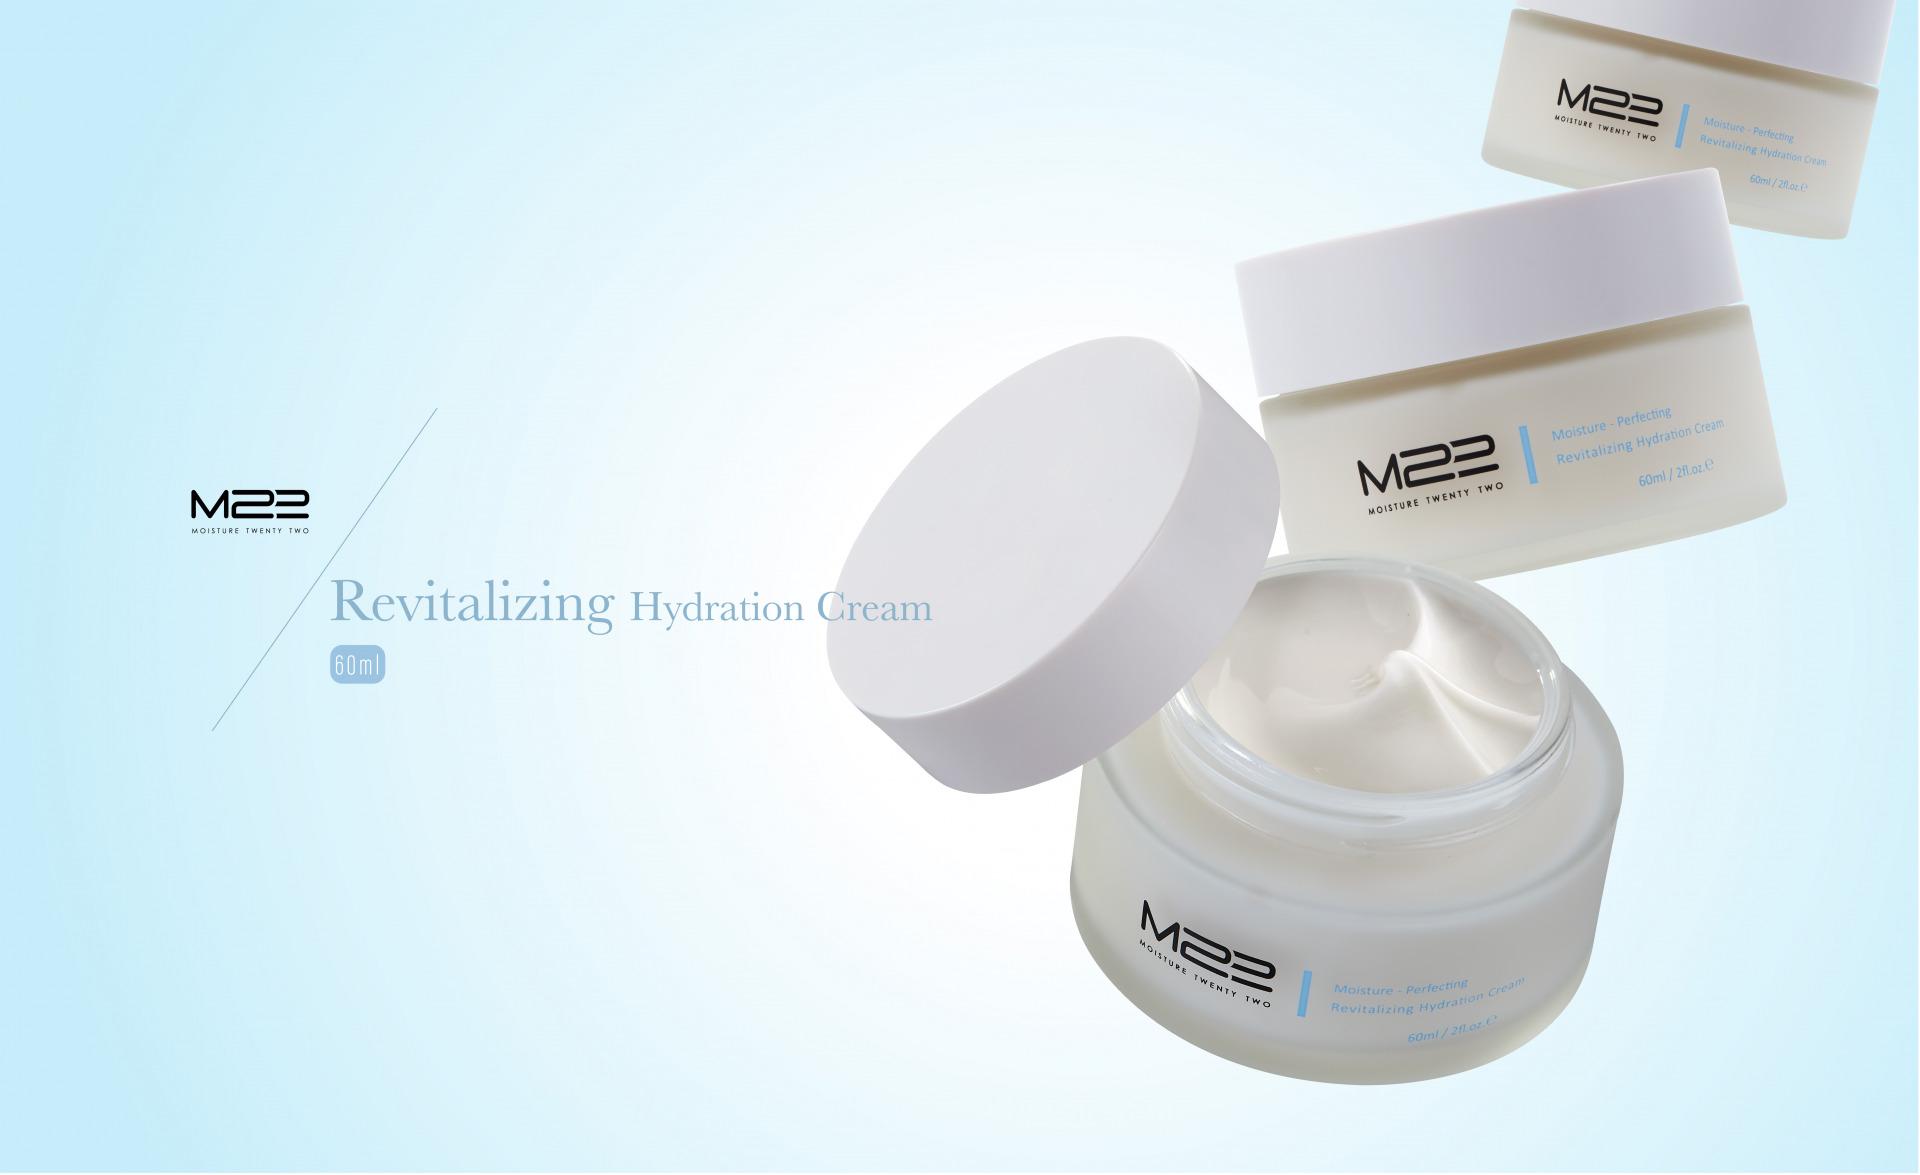 M22_Revitalizing Hydration Cream_V2_index_en